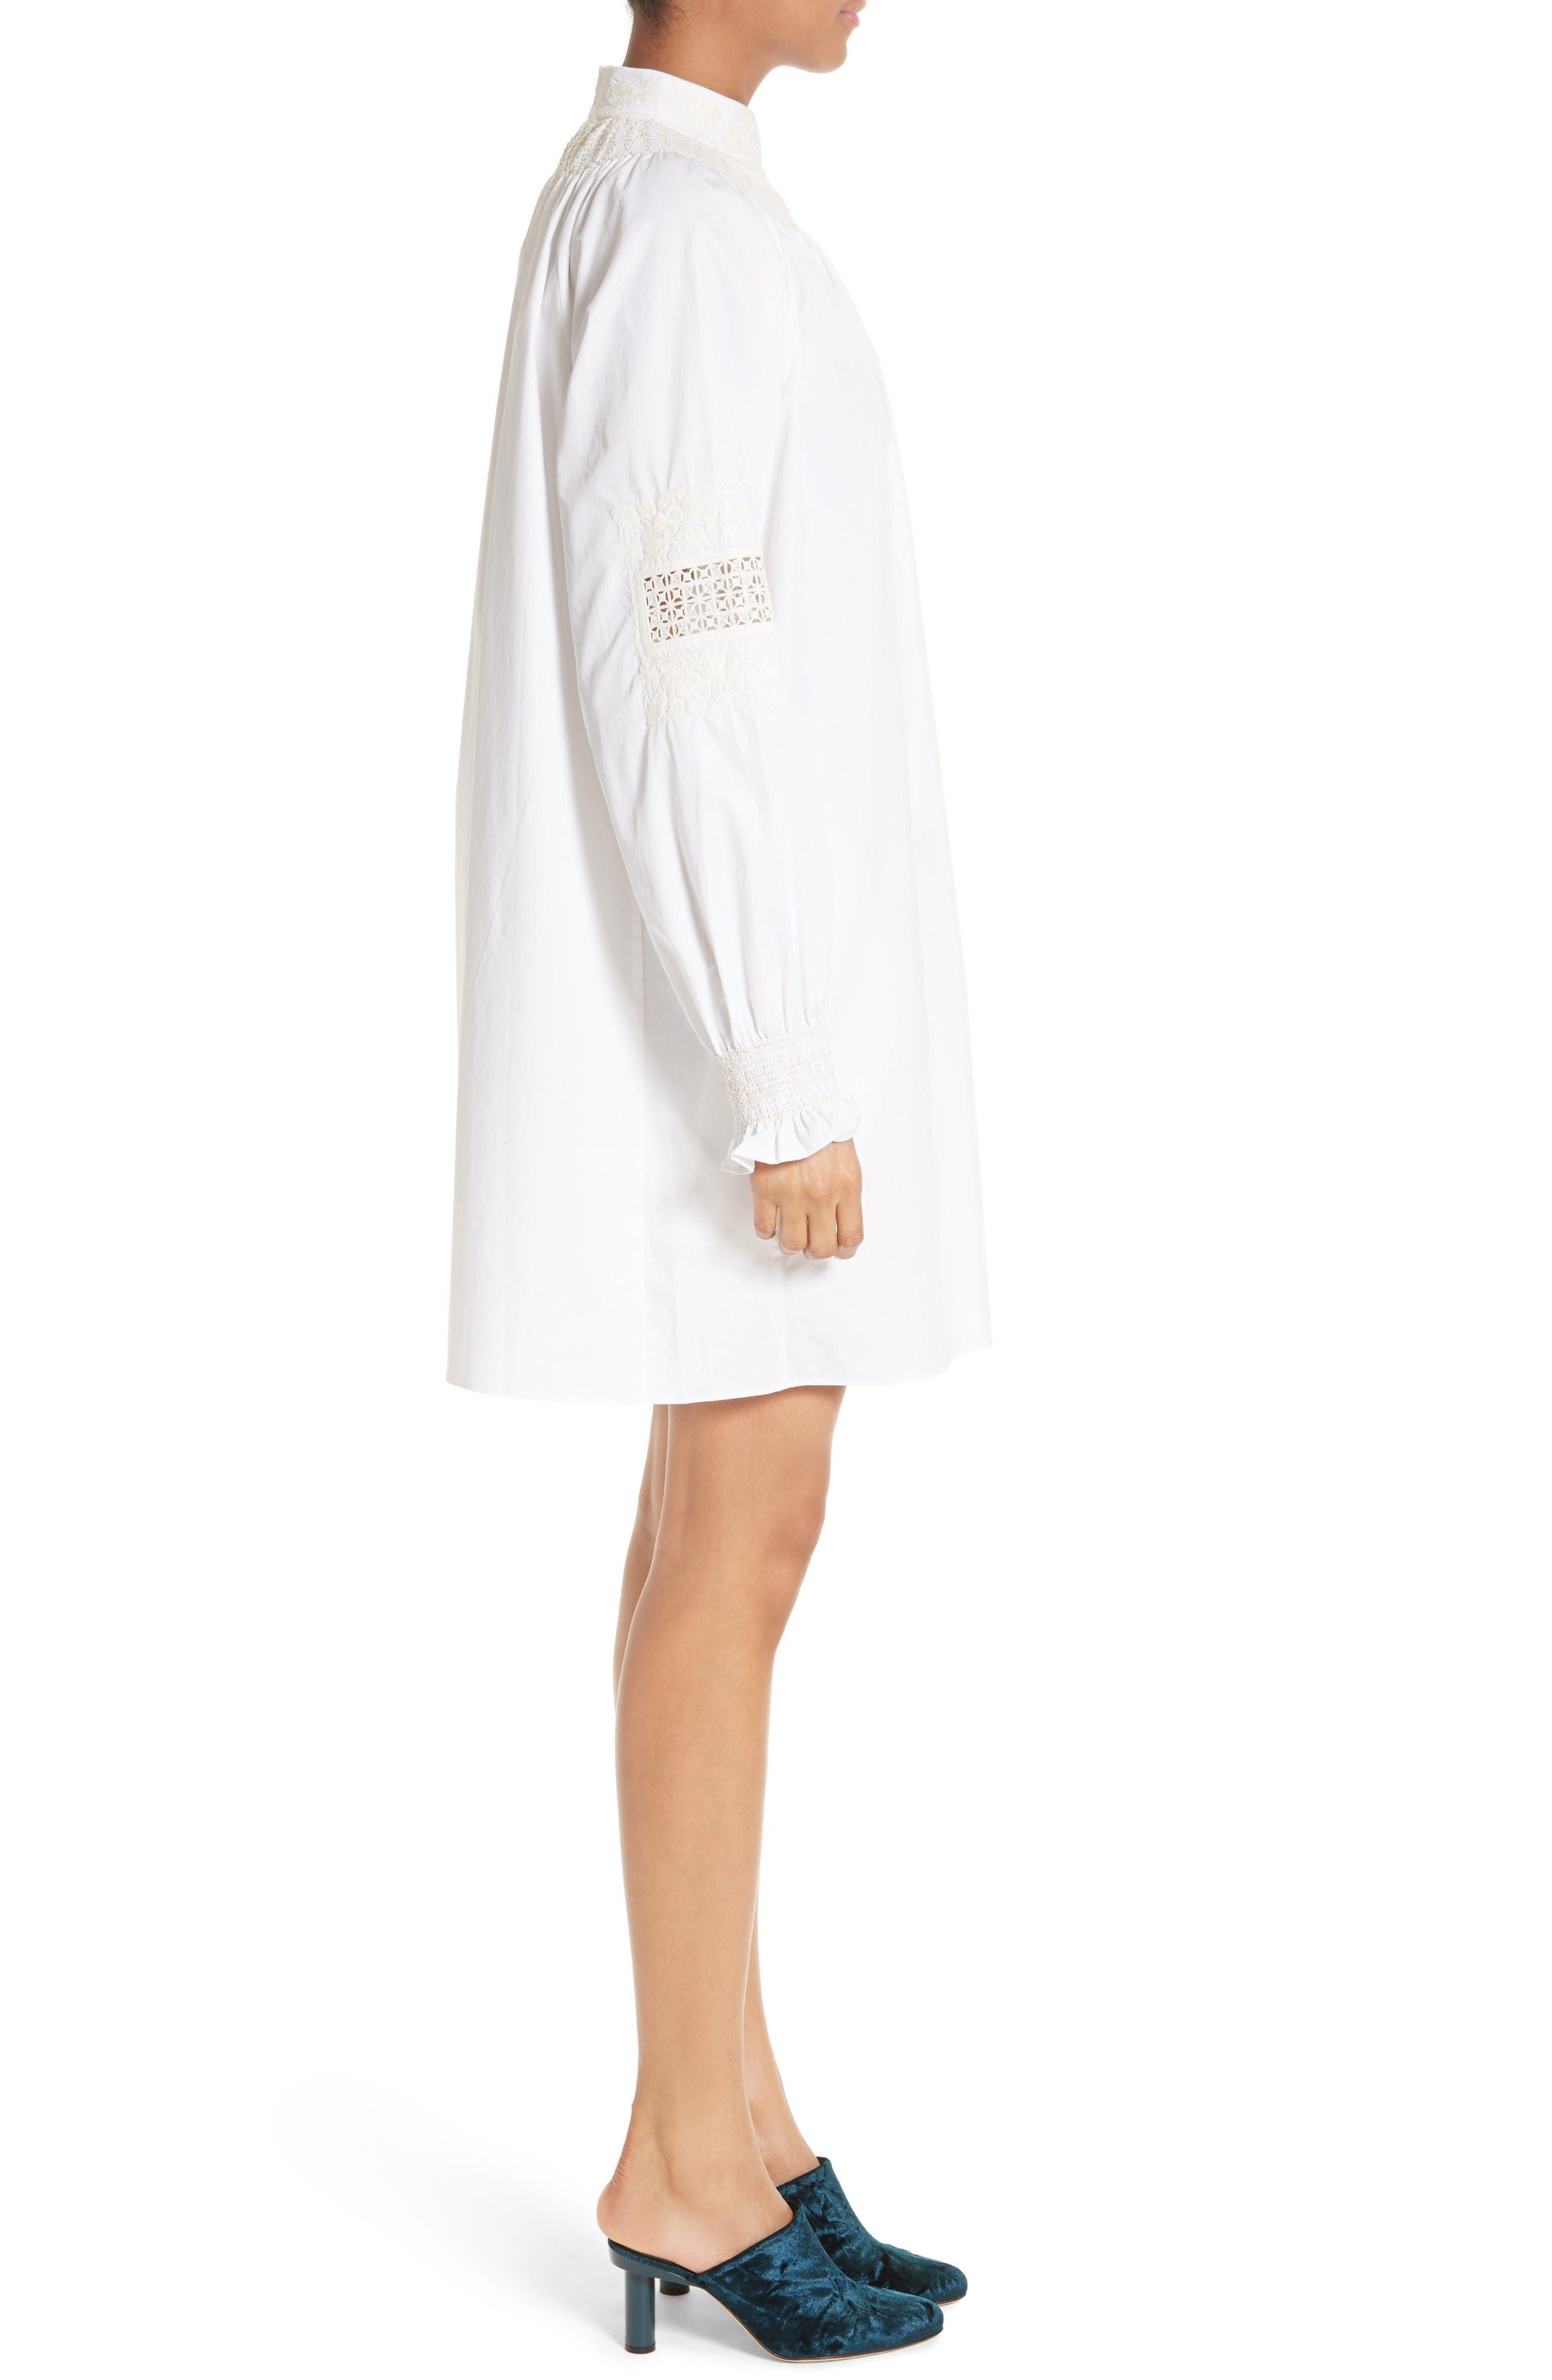 Smocked Tunic Dress,                             Alternate thumbnail 3, color,                             White/ Ivory Multi